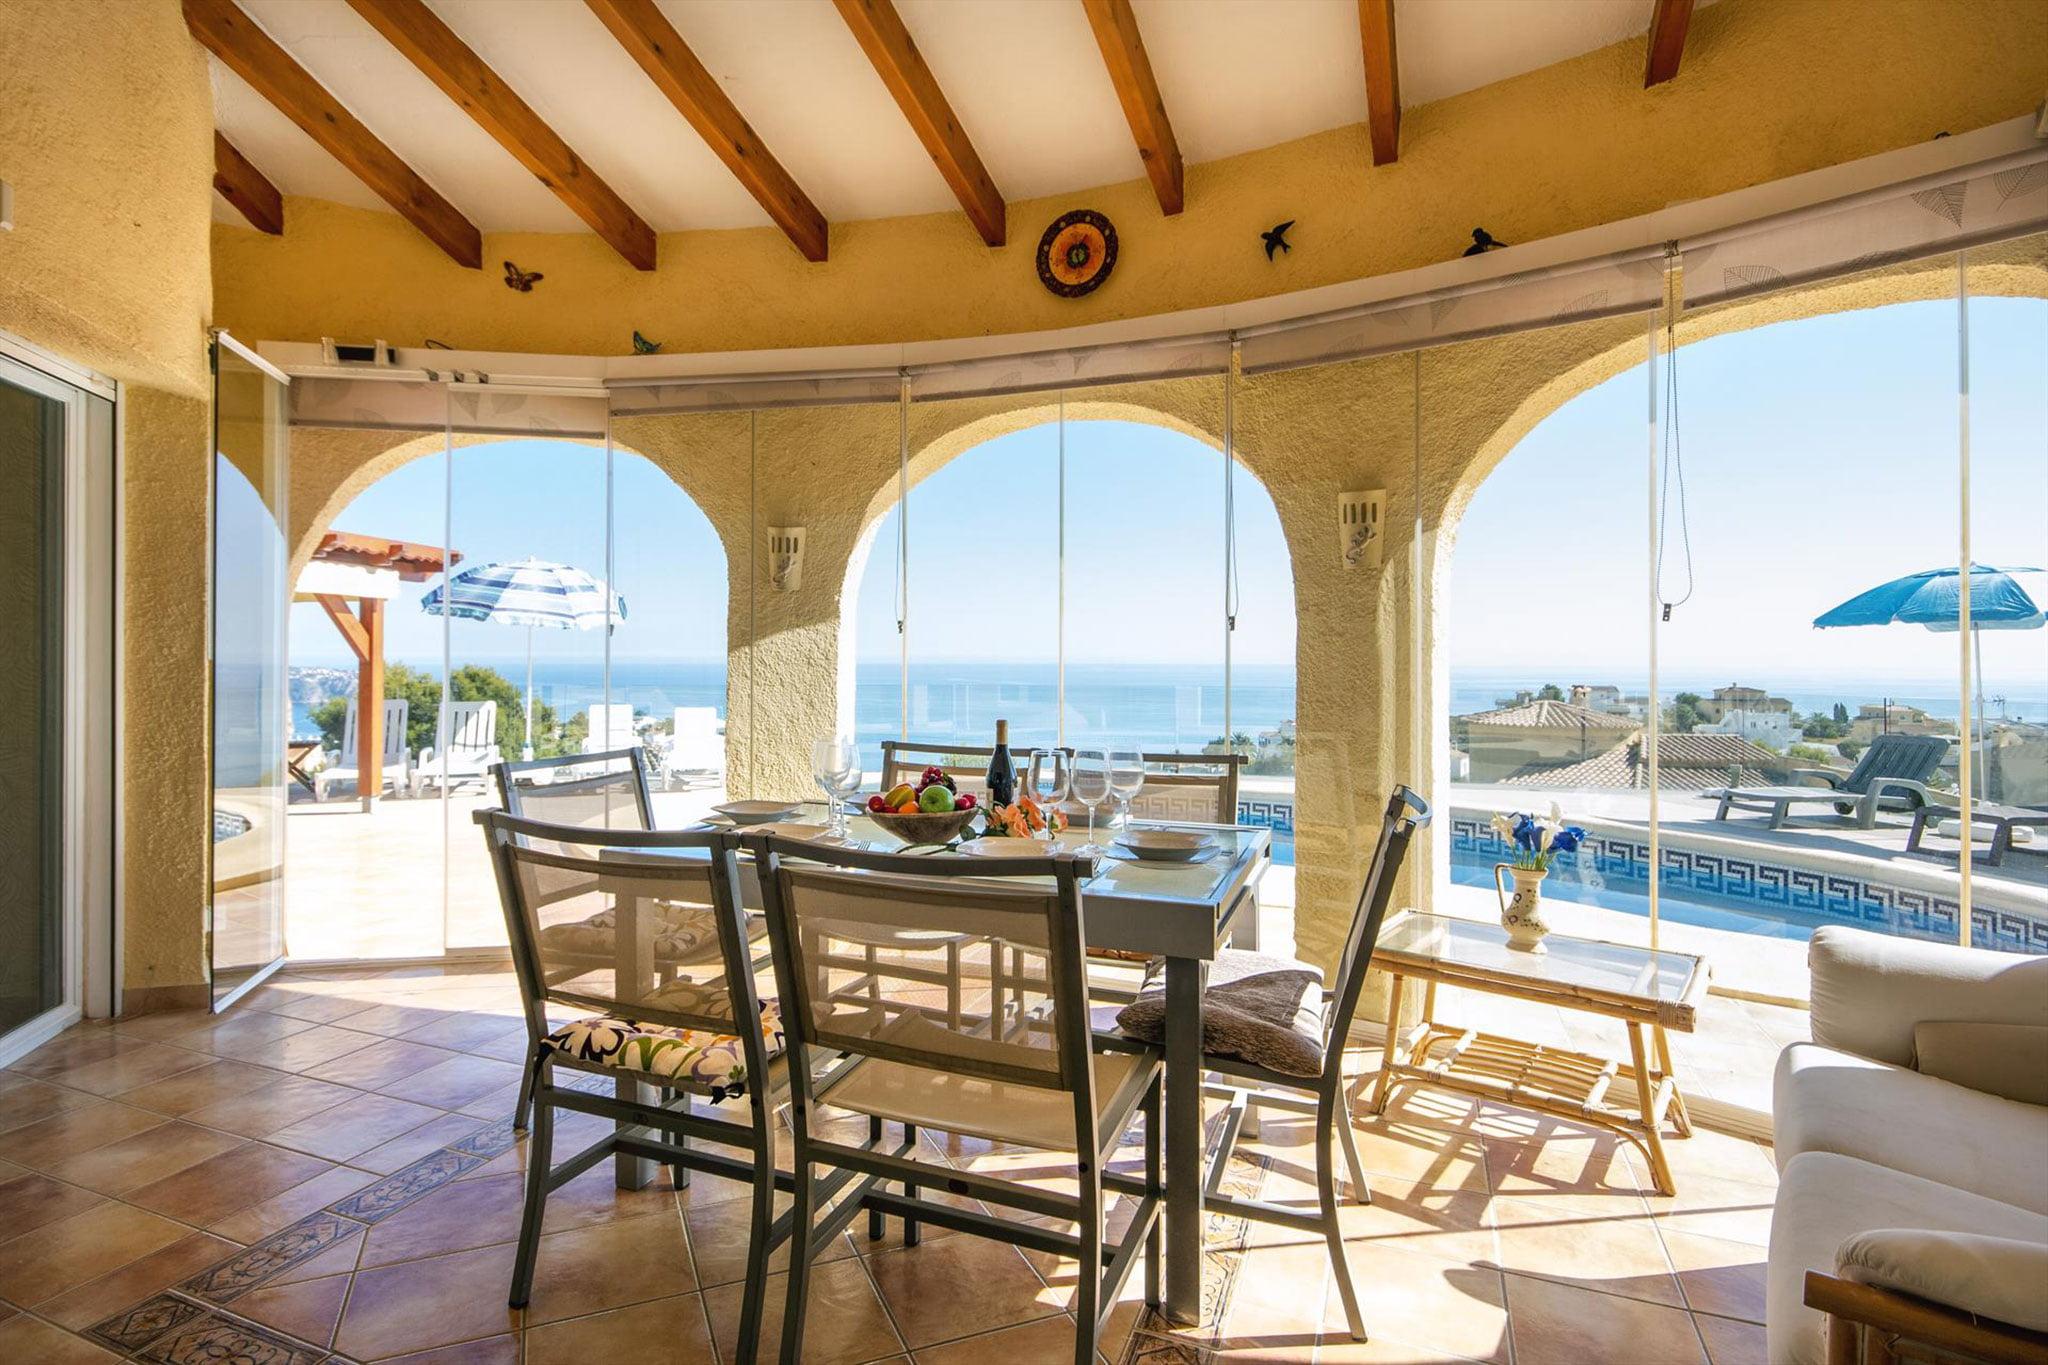 Terraza acristalada en una casa de alquiler de vacaciones en Benitachell – Aguila Rent a Villa